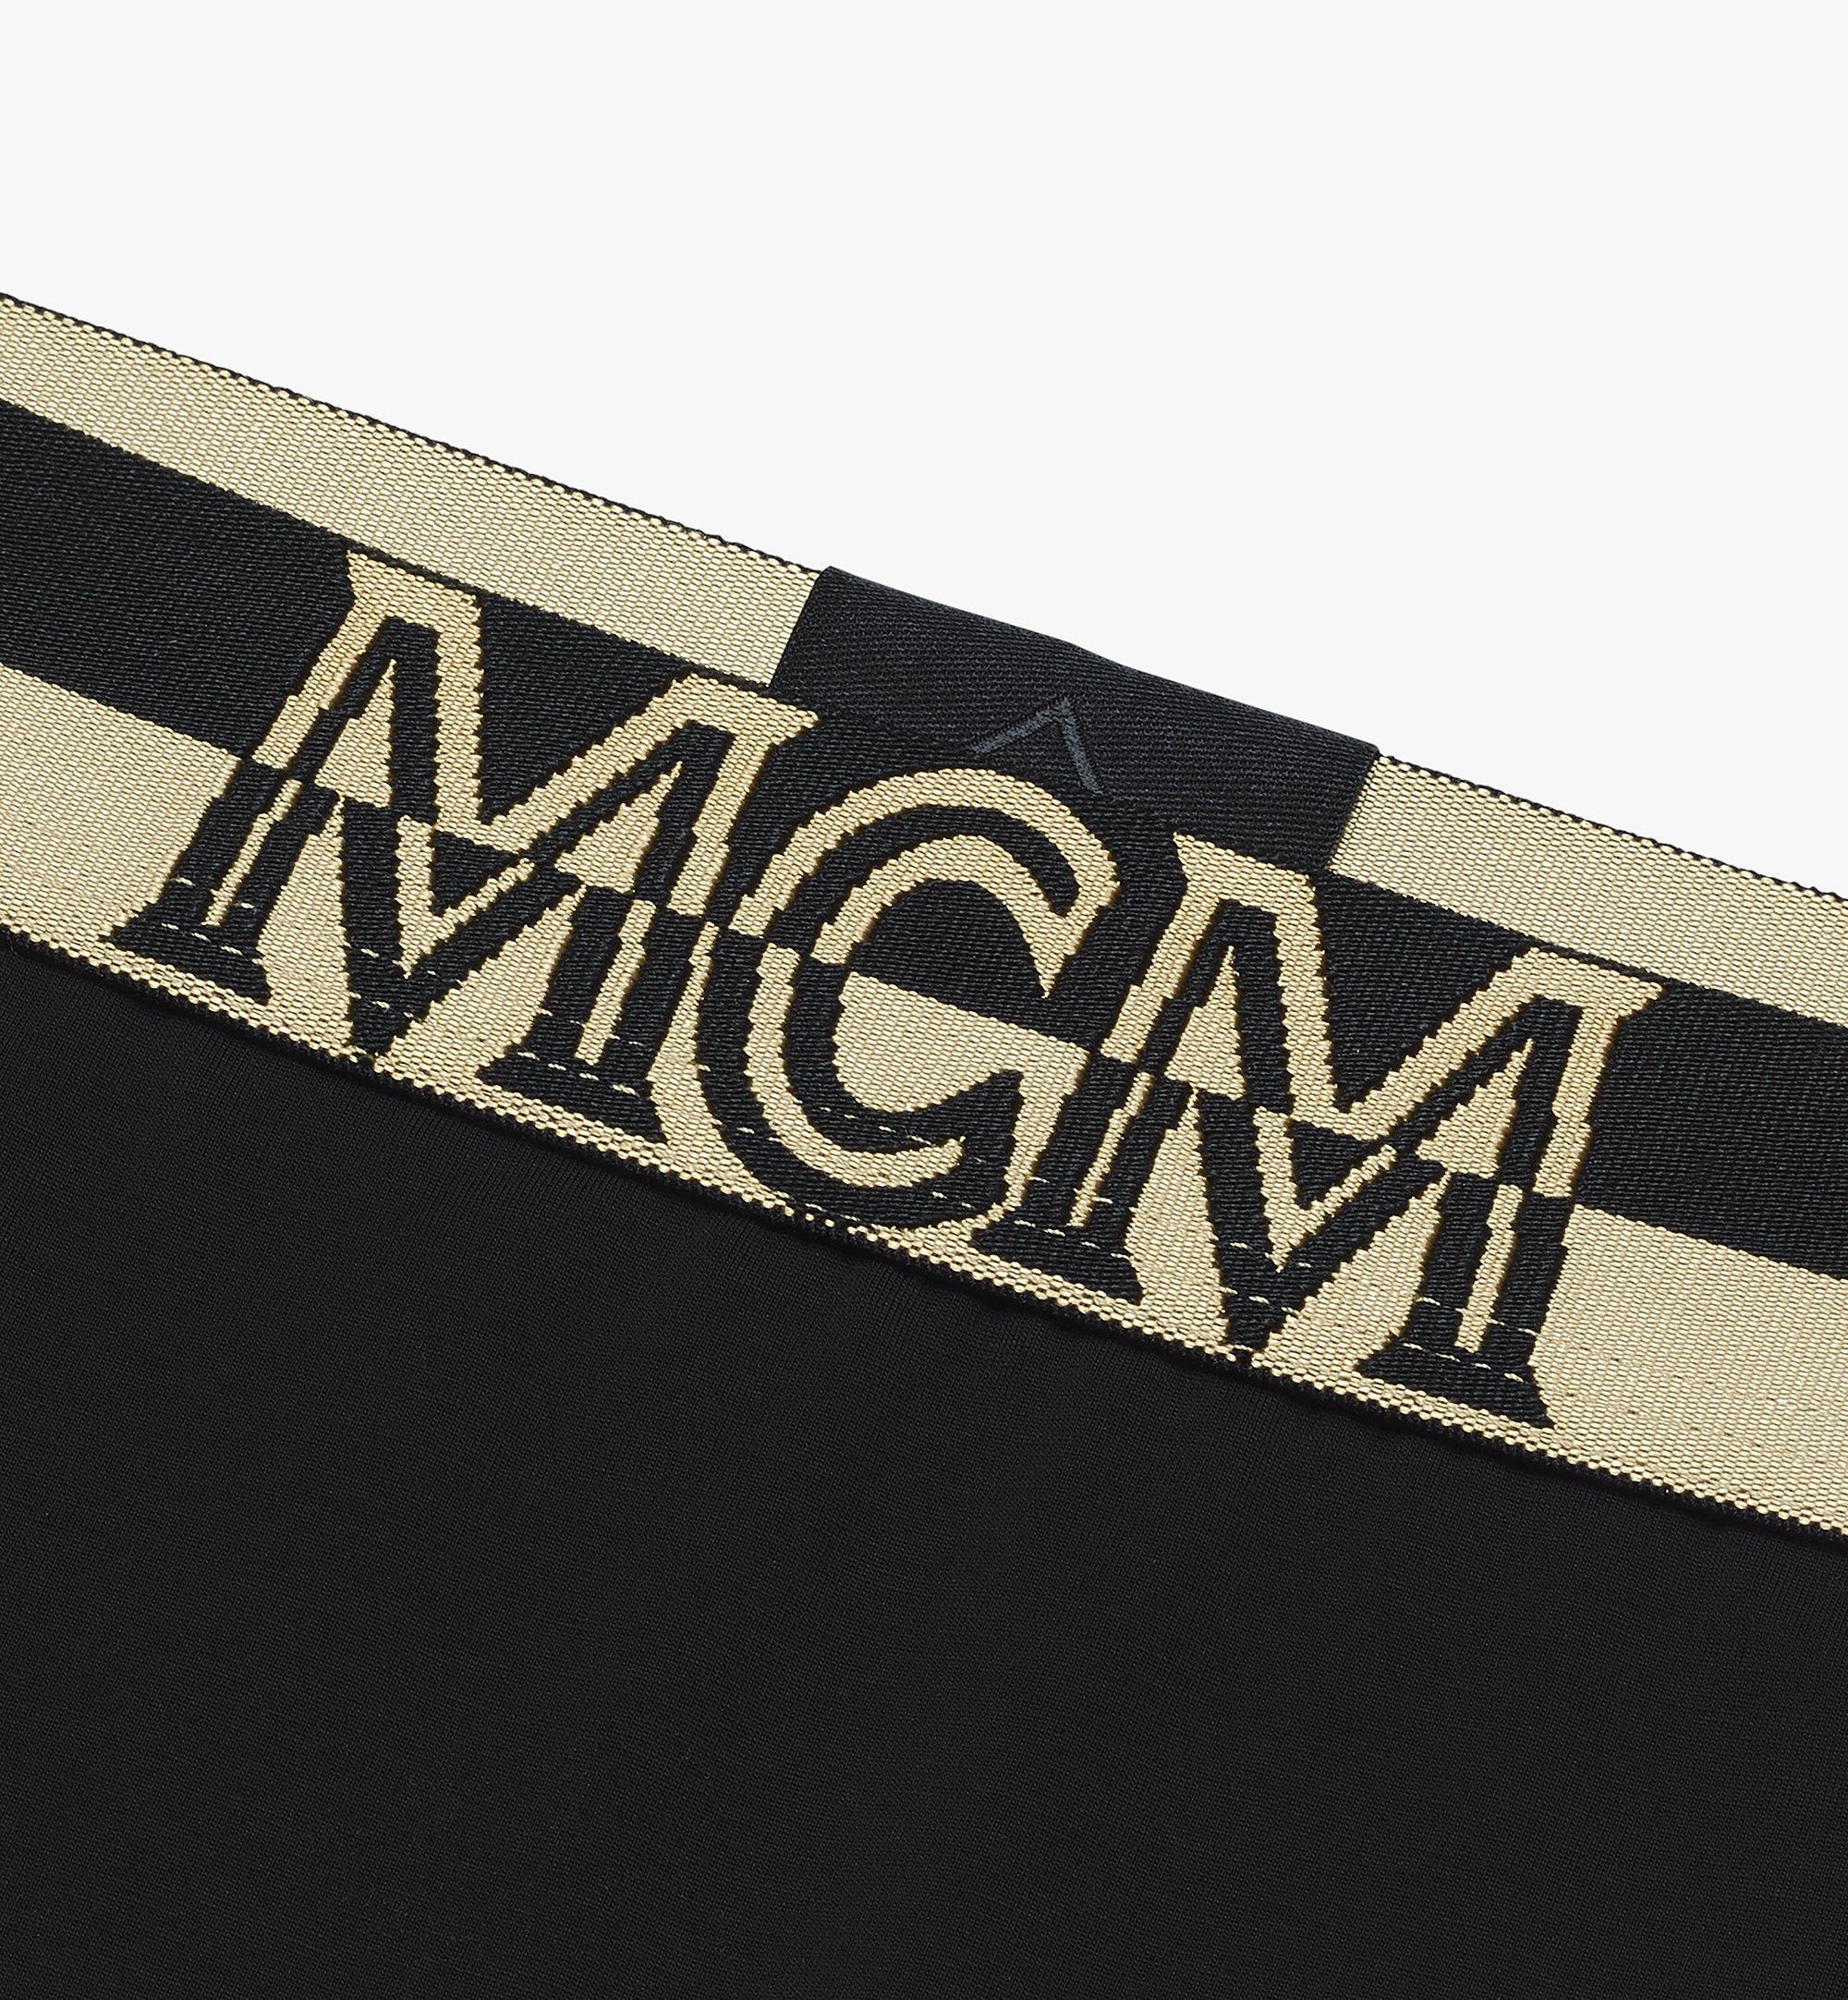 MCM Women's 1976 Briefs Black MFYASBM04BK00M Alternate View 2